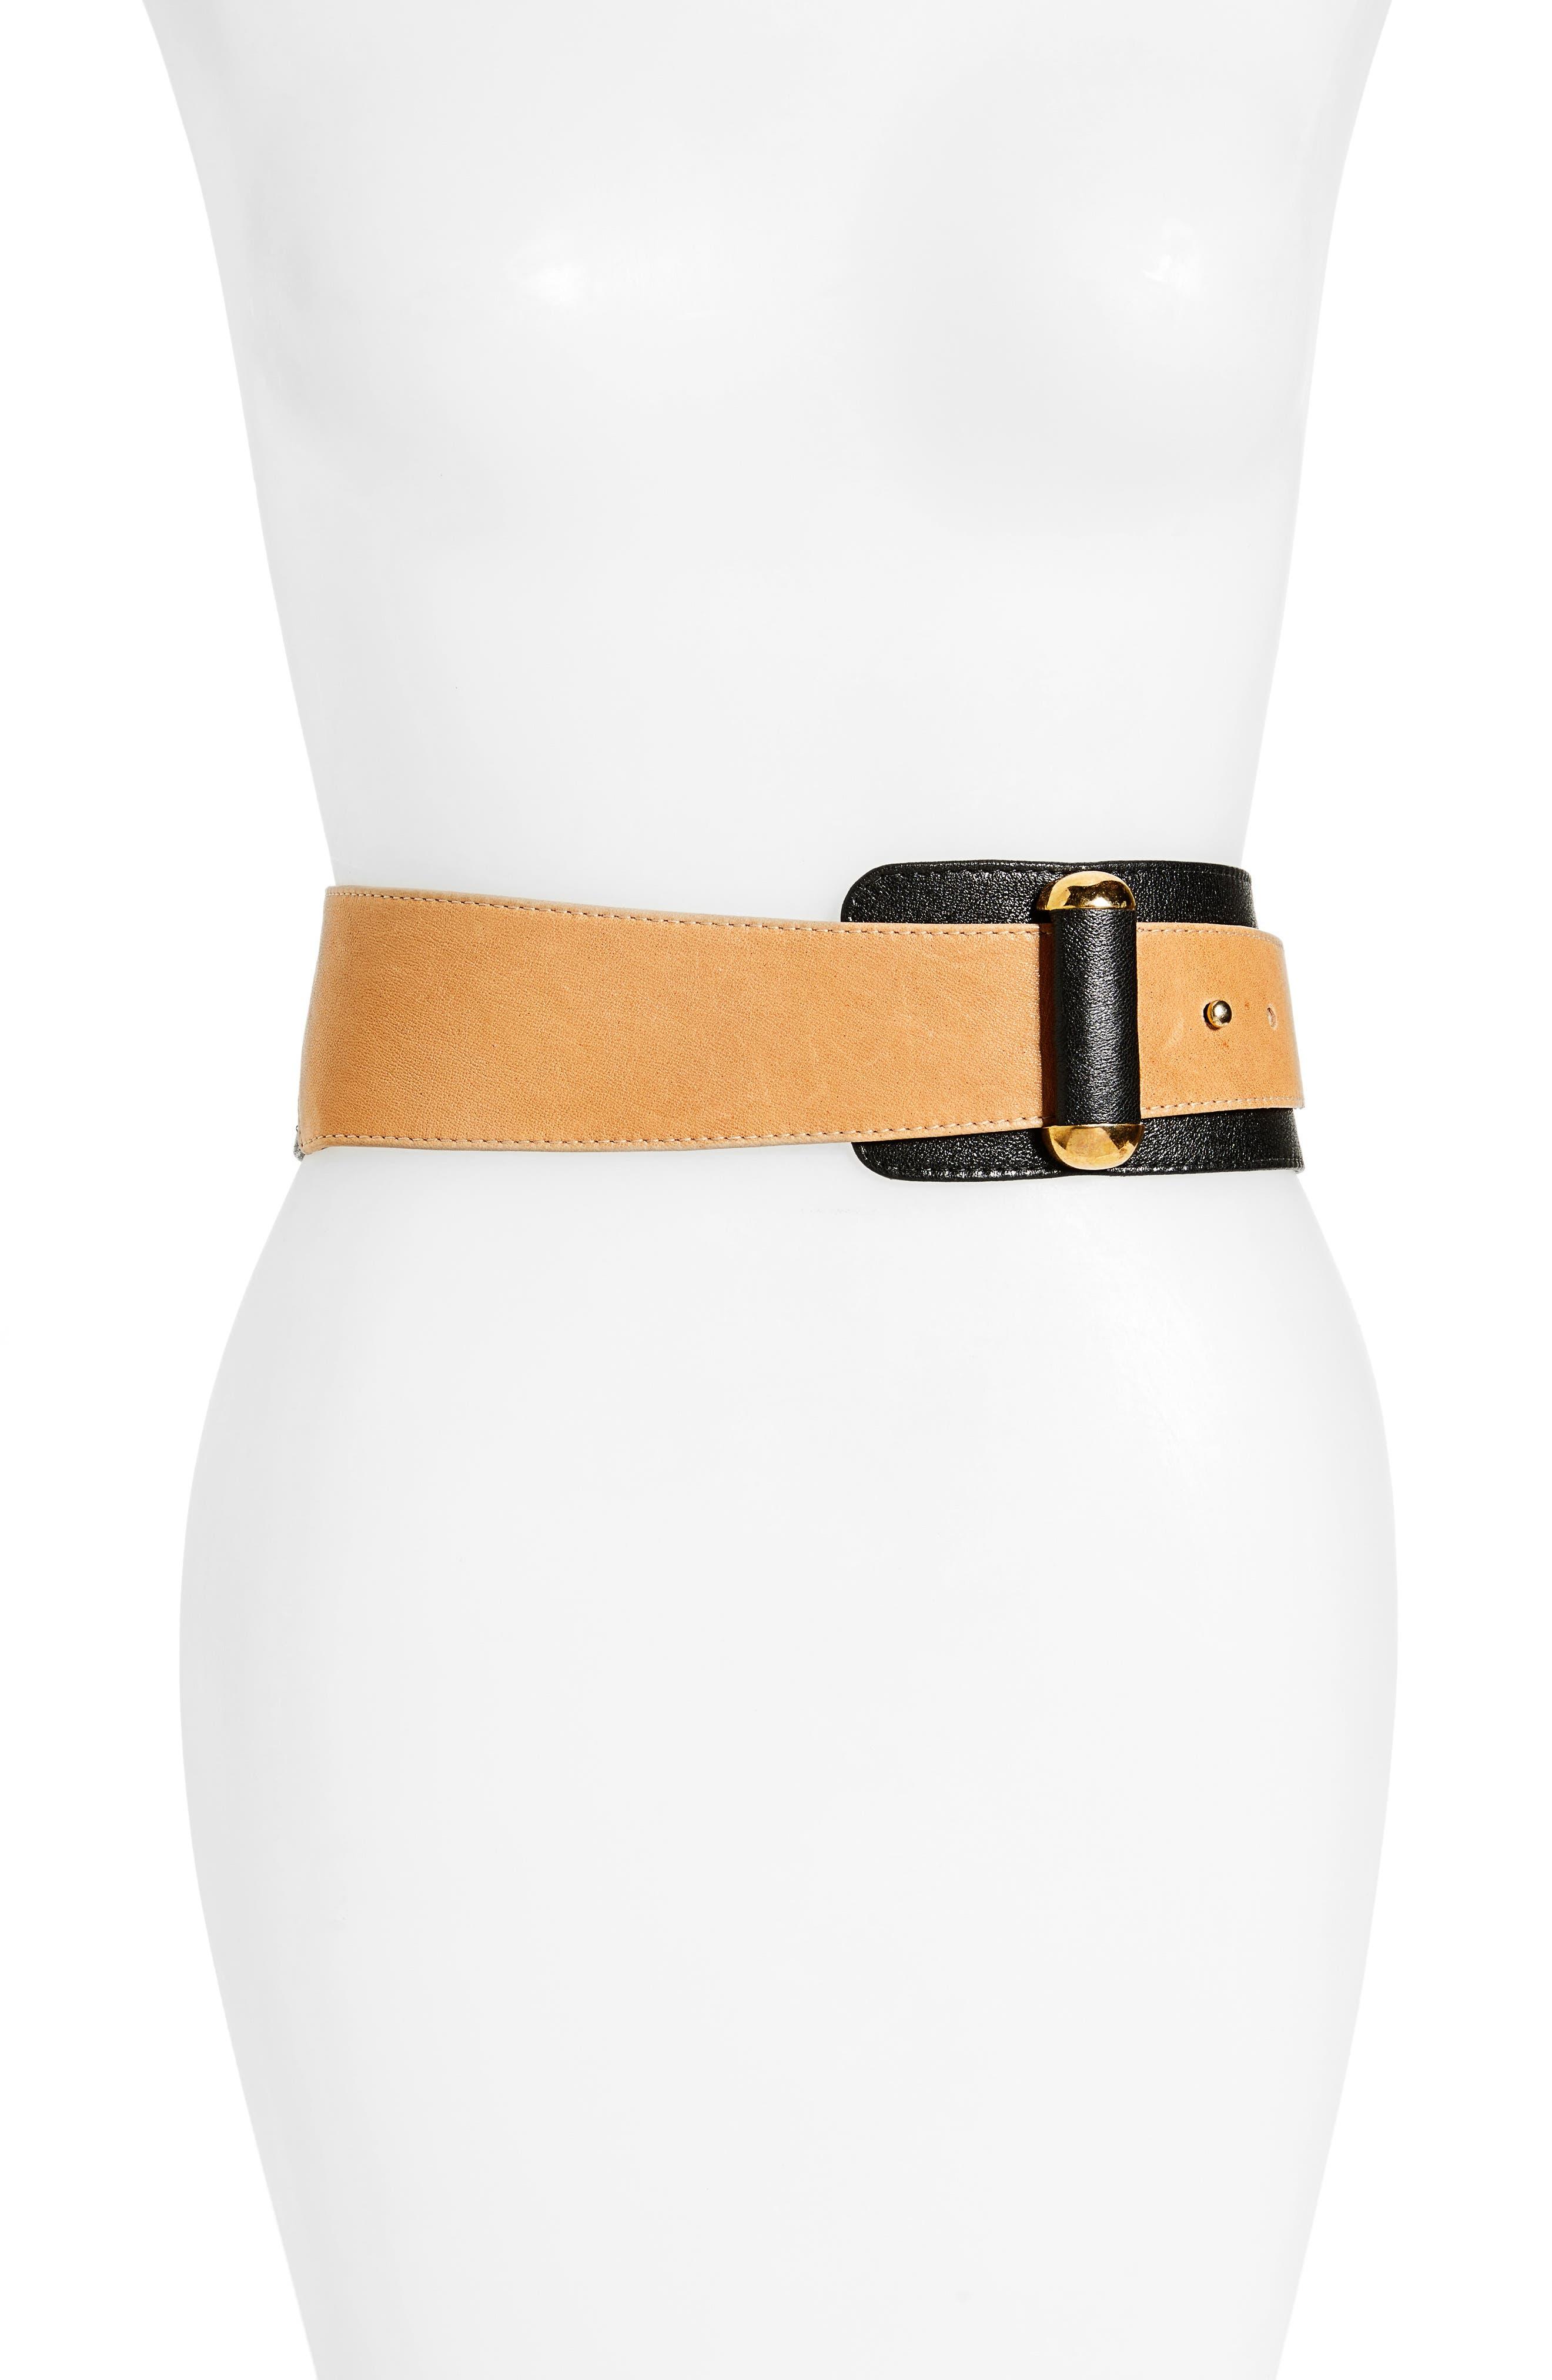 RAINA,                             Vixen Leather Belt,                             Main thumbnail 1, color,                             BLACK/ BROWN